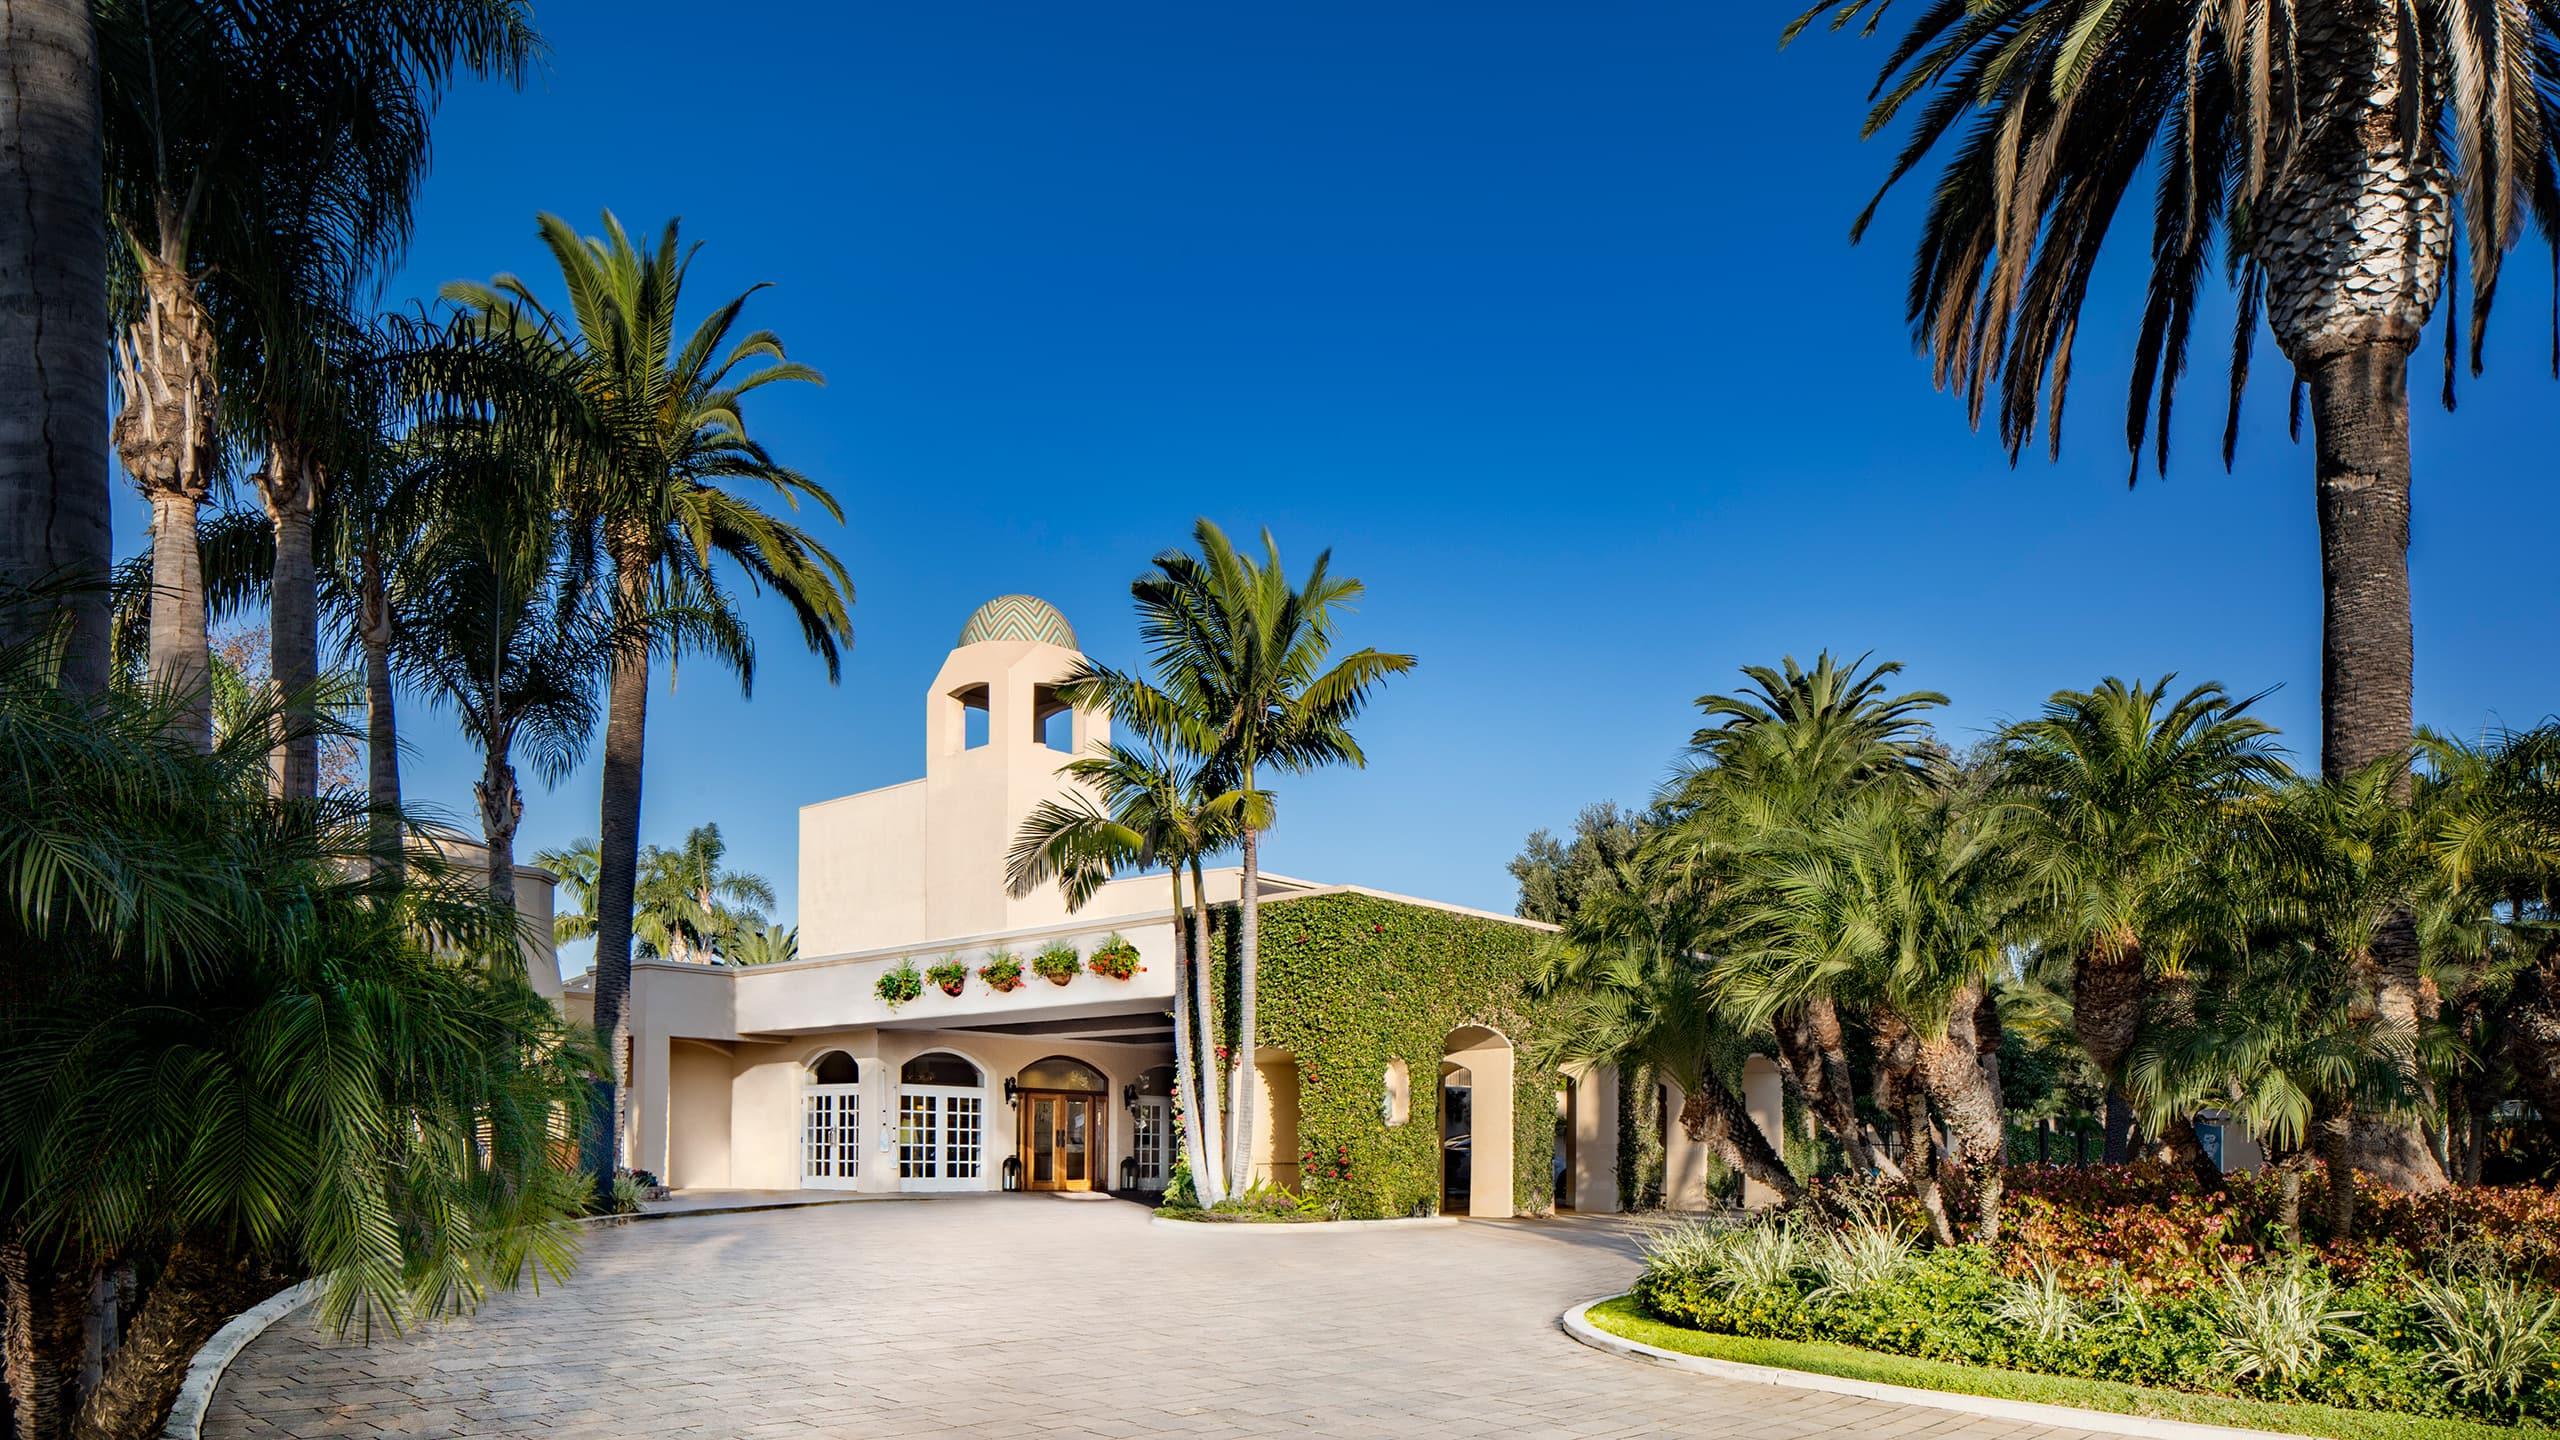 Palm dating service Newport Beach